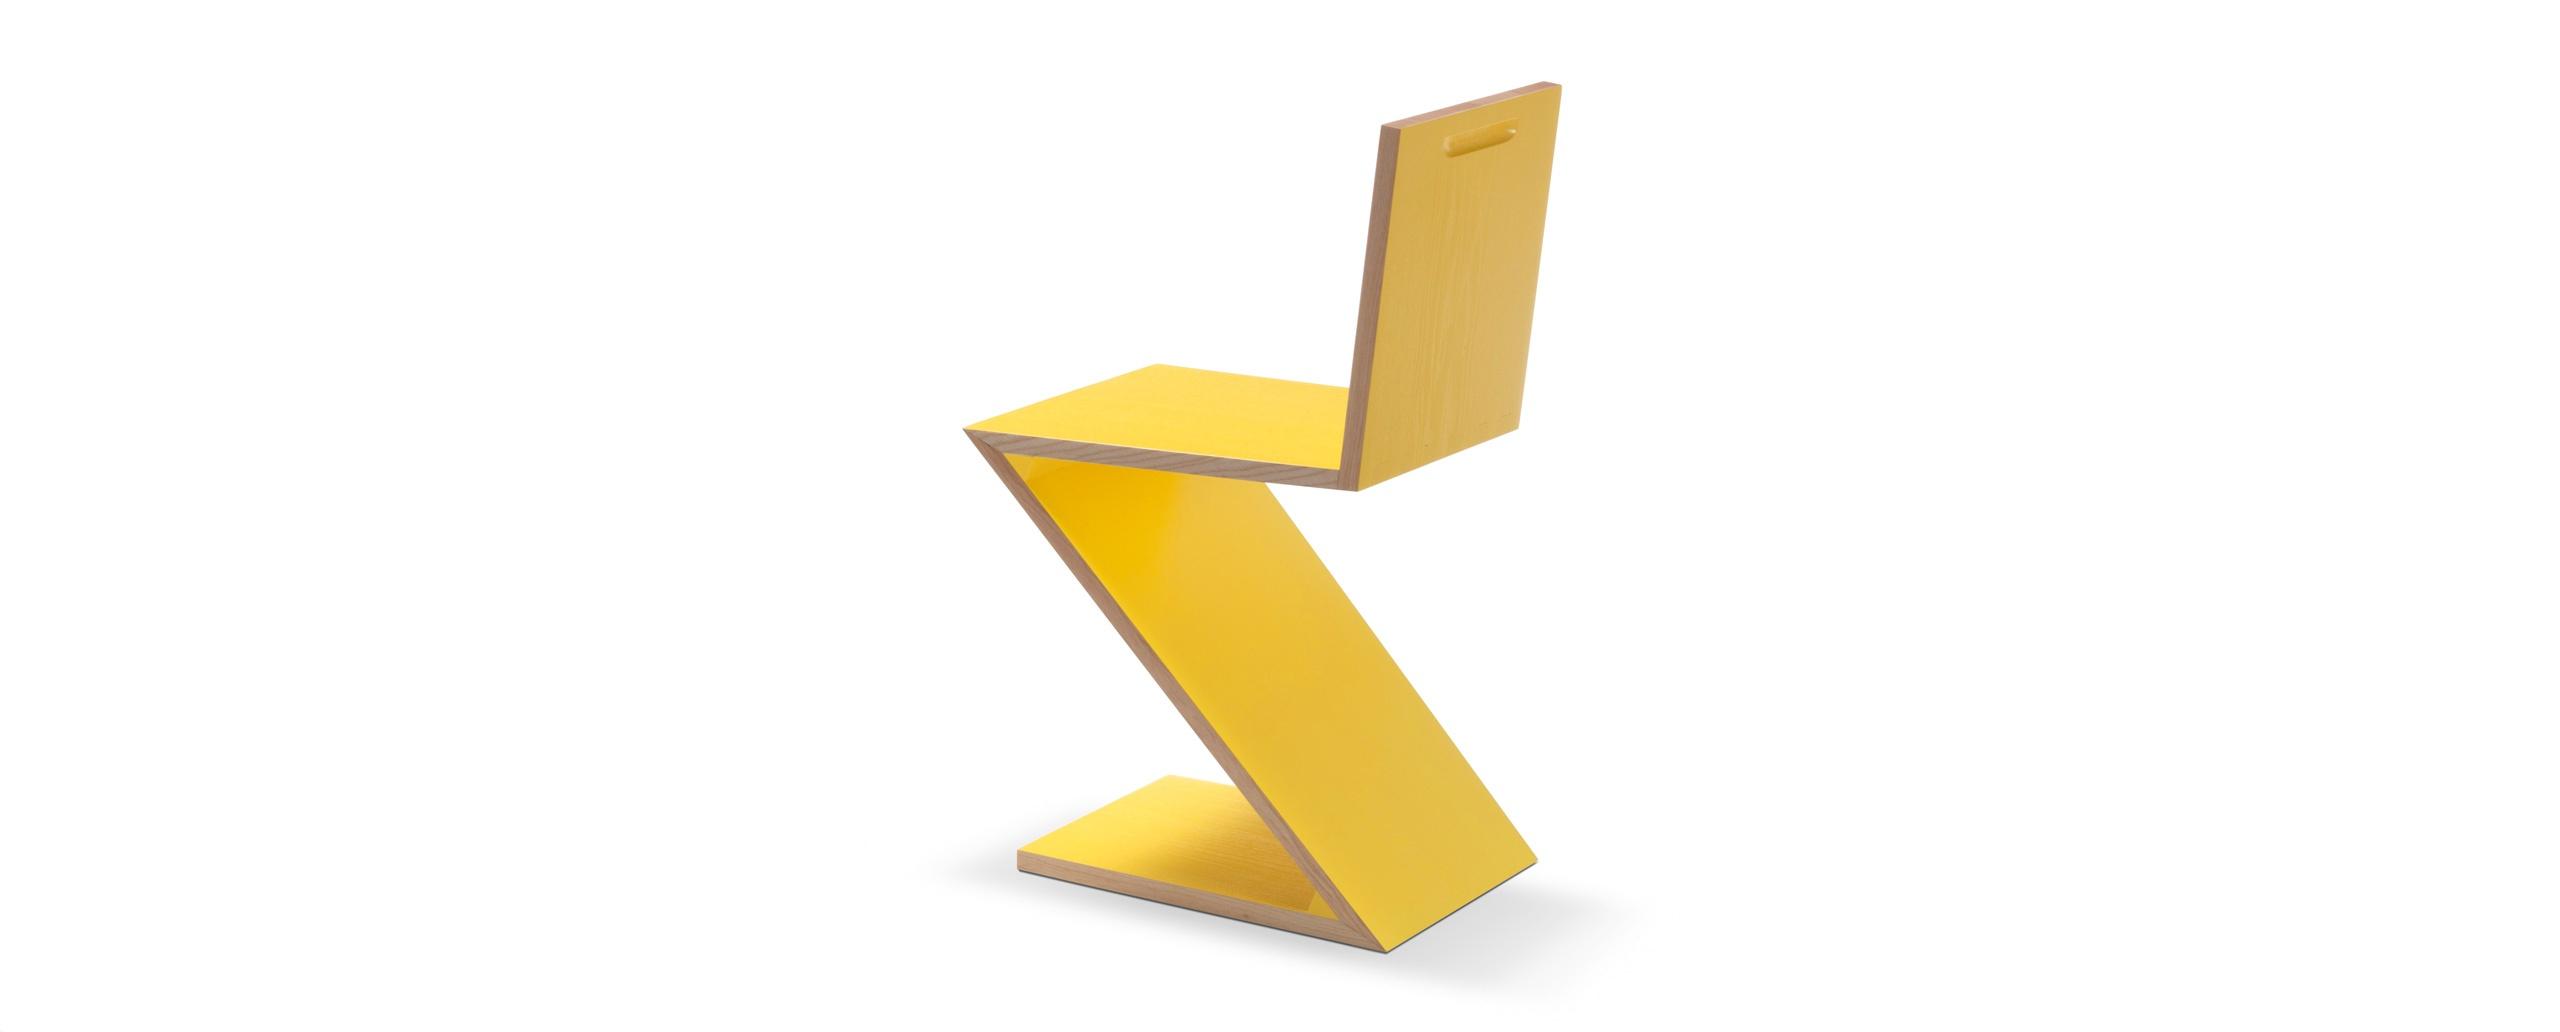 Bauhaus 4 zickzack stuhl von gerrit thomas rietveld for Design stuhl zig zag